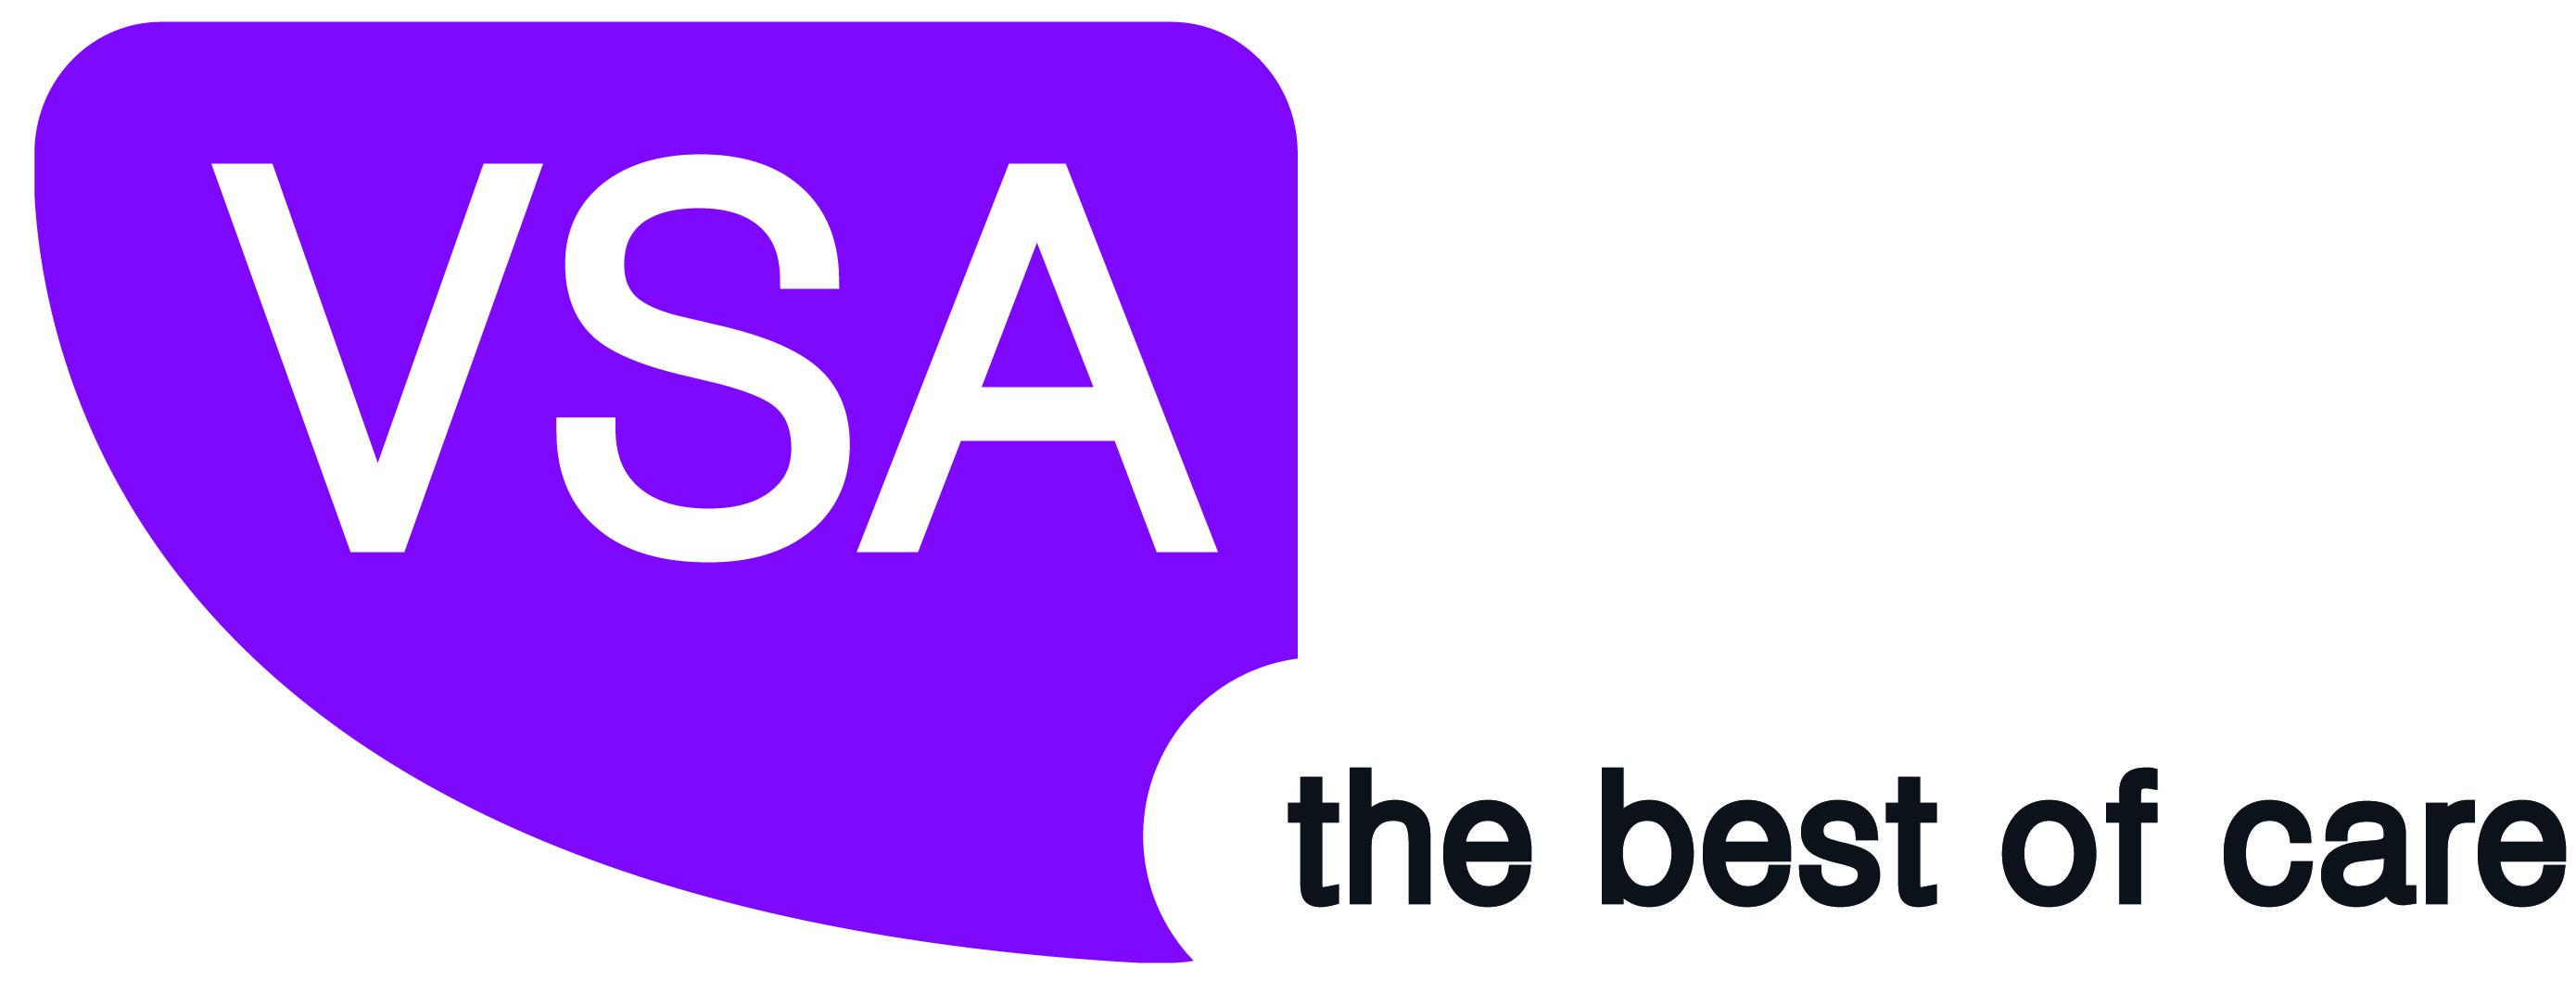 VSA_Logo_purple high res-01